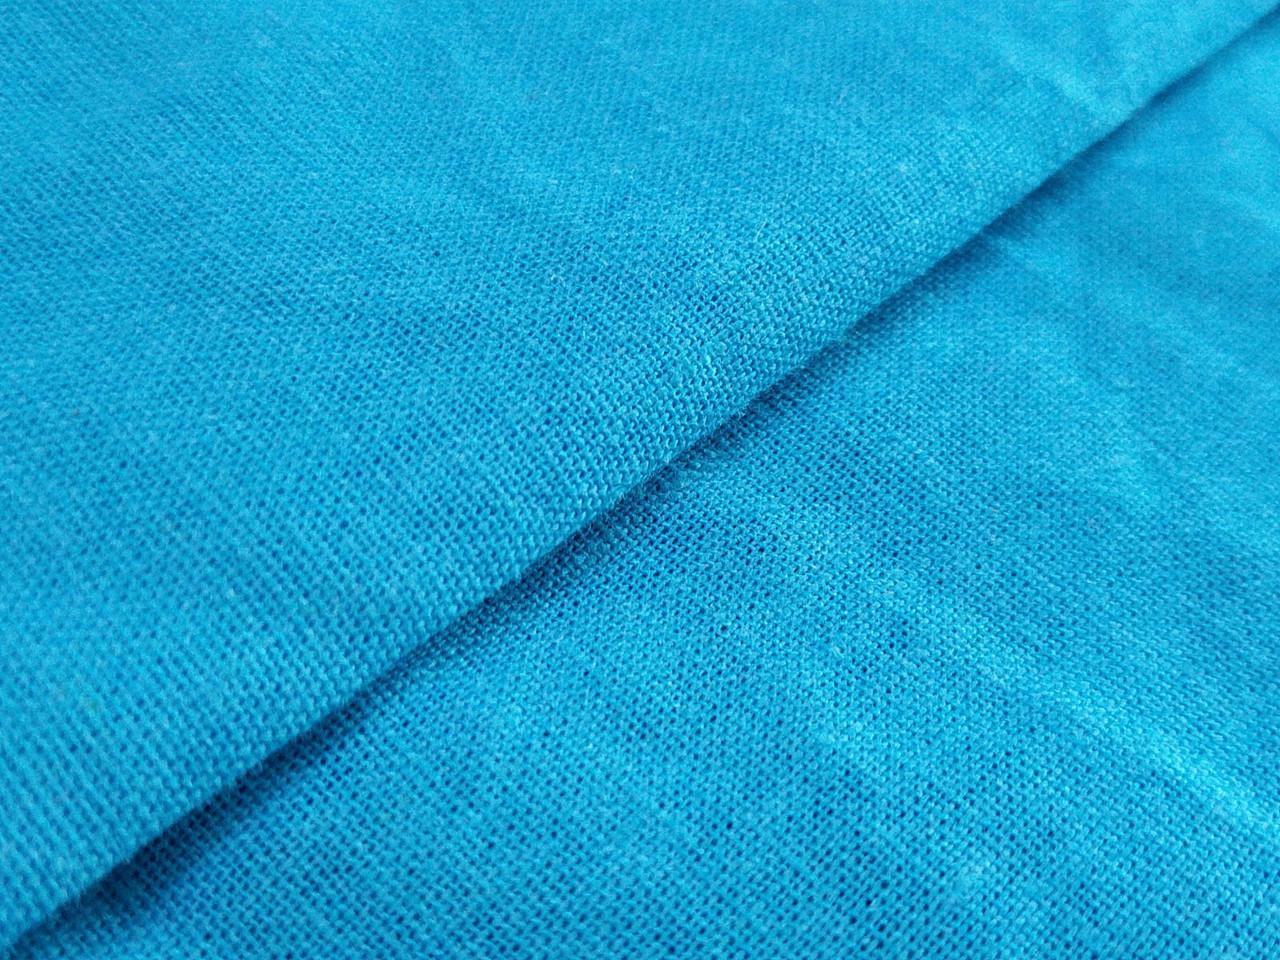 Лен однотонный, яркий голубой